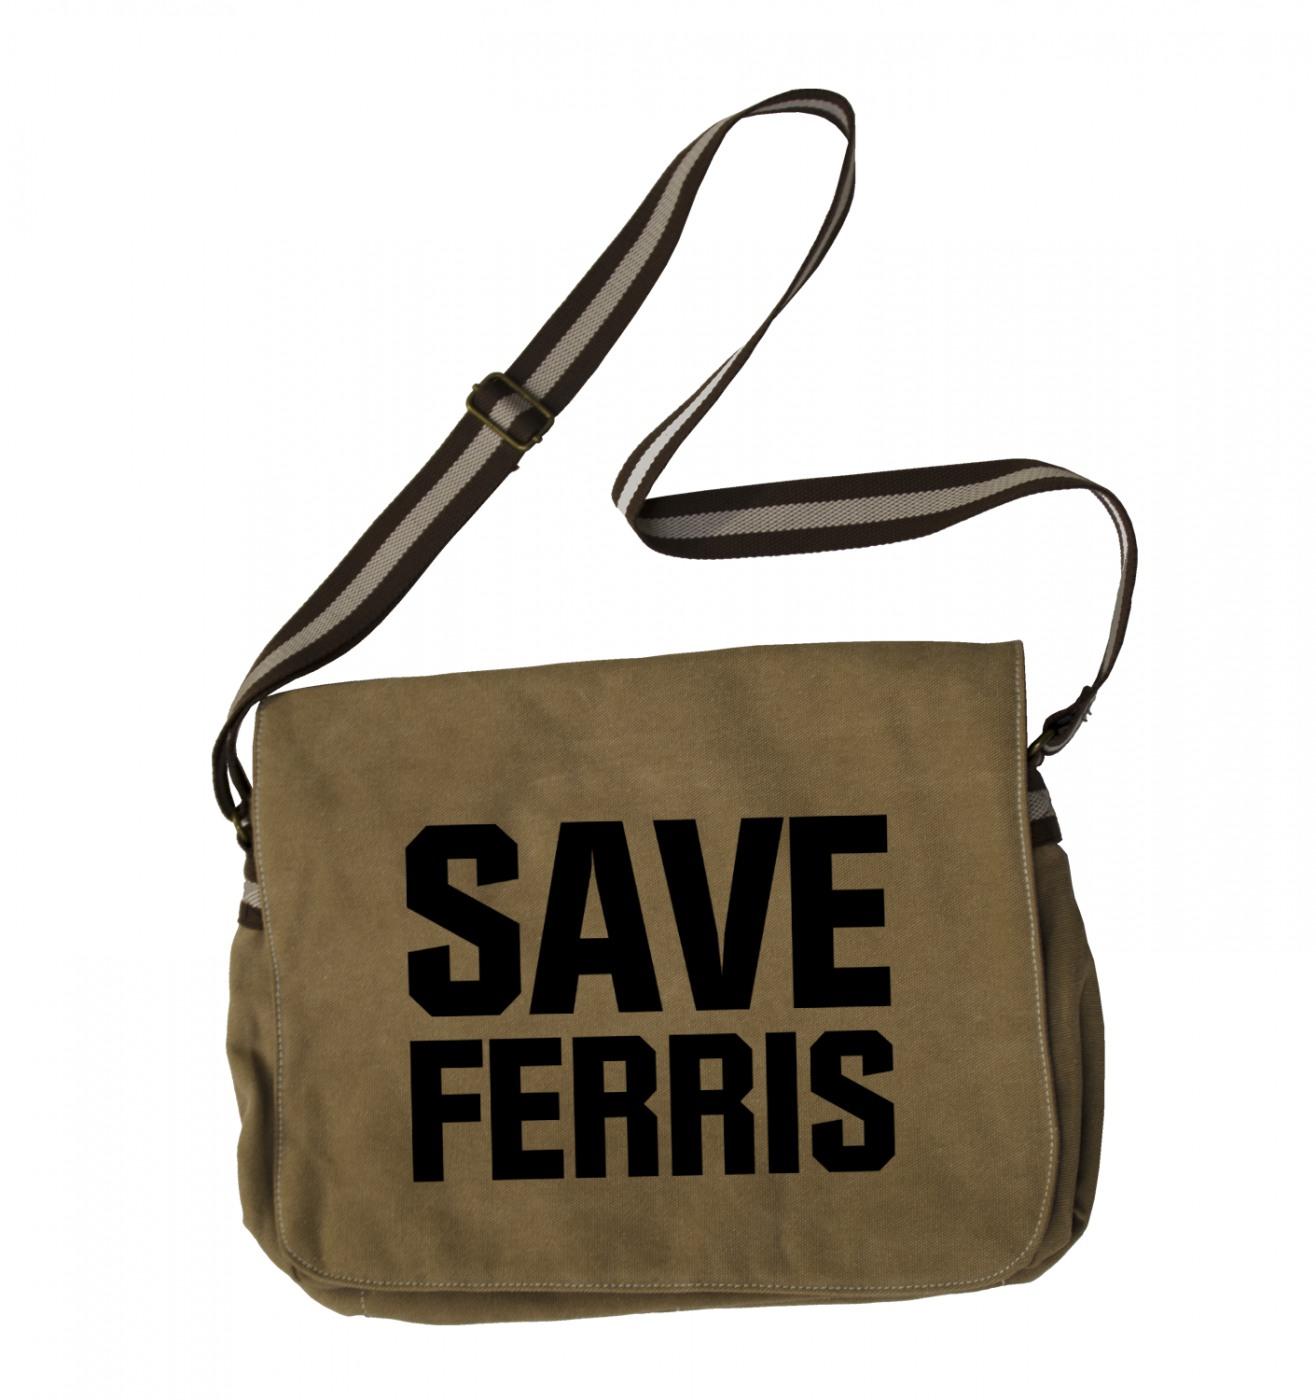 Save Ferris messenger bag